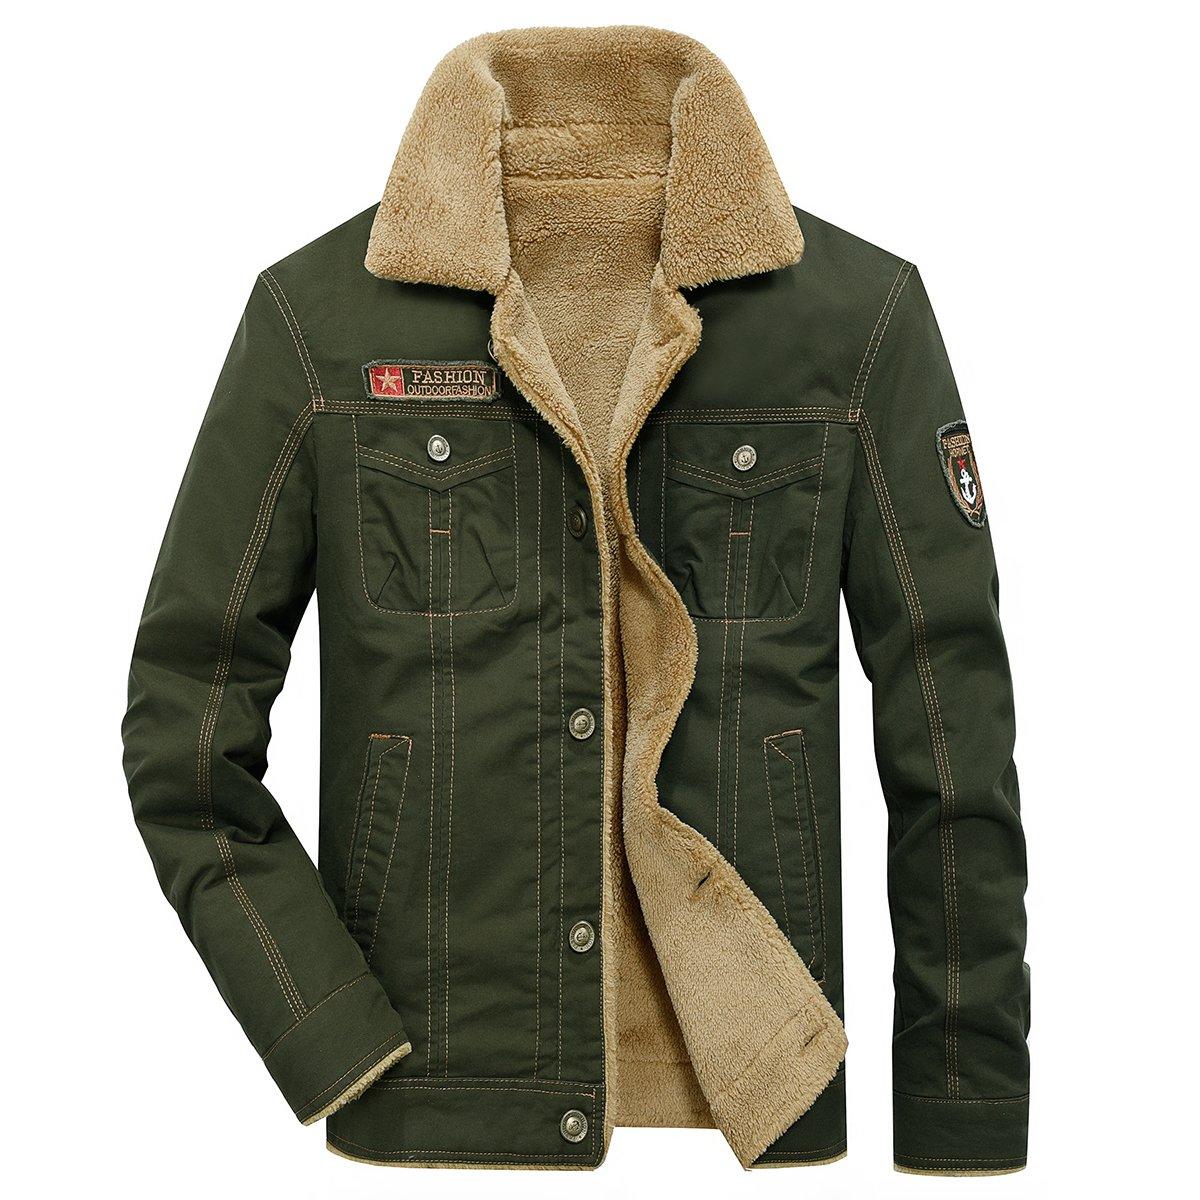 336b10eaba1 Top 10 wholesale Vintage Embroidered Bomber Jacket - Chinabrands.com